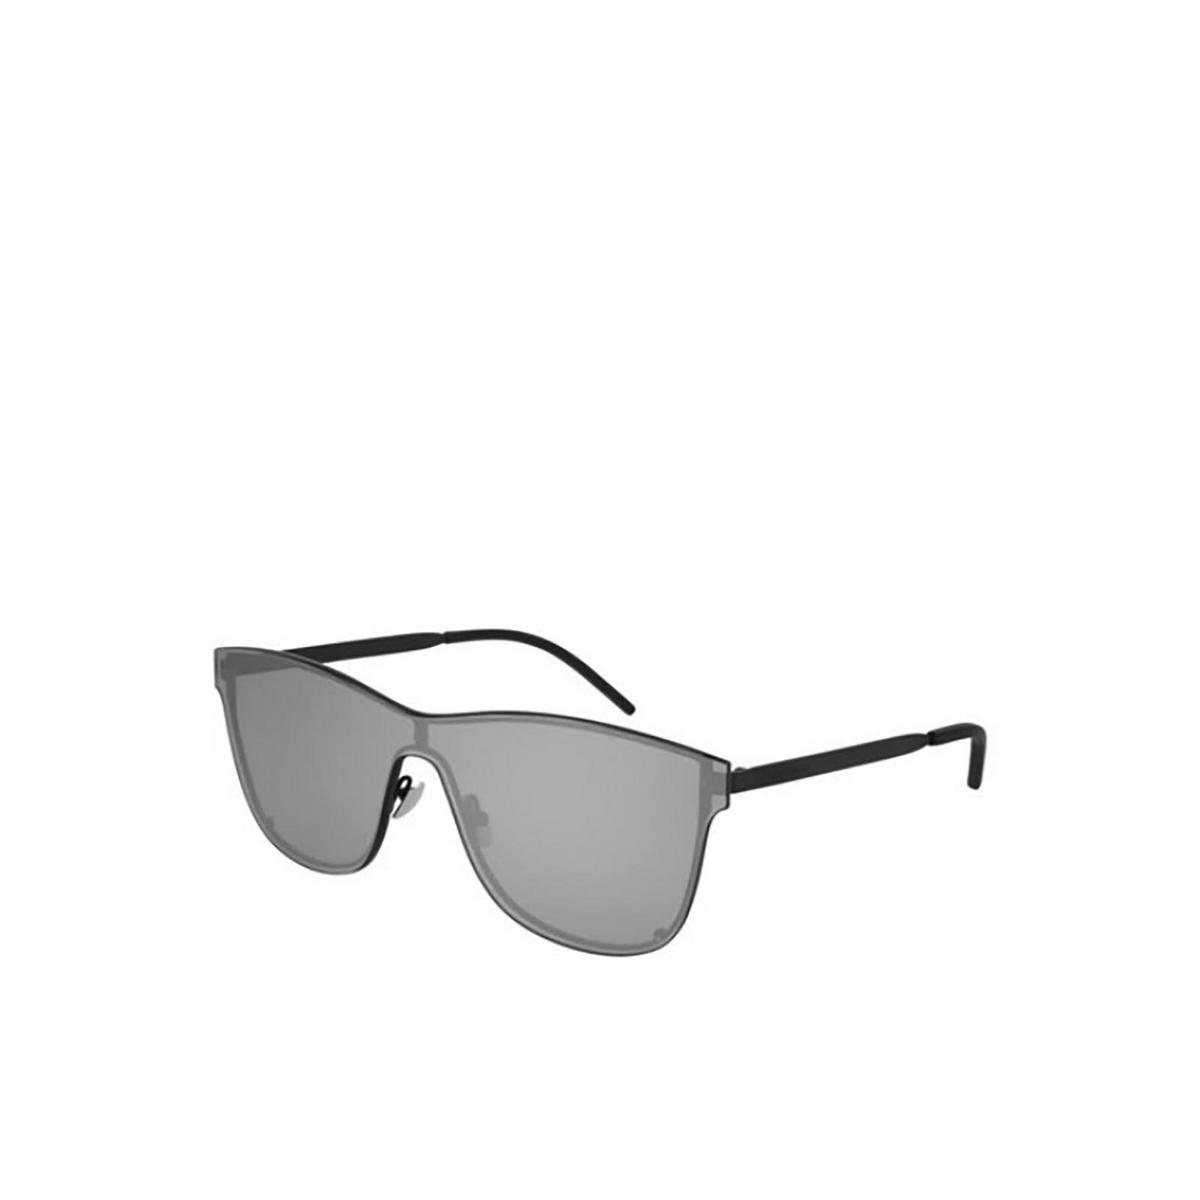 Saint Laurent® Mask Sunglasses: SL 51 OVER MASK color Black 003 - three-quarters view.